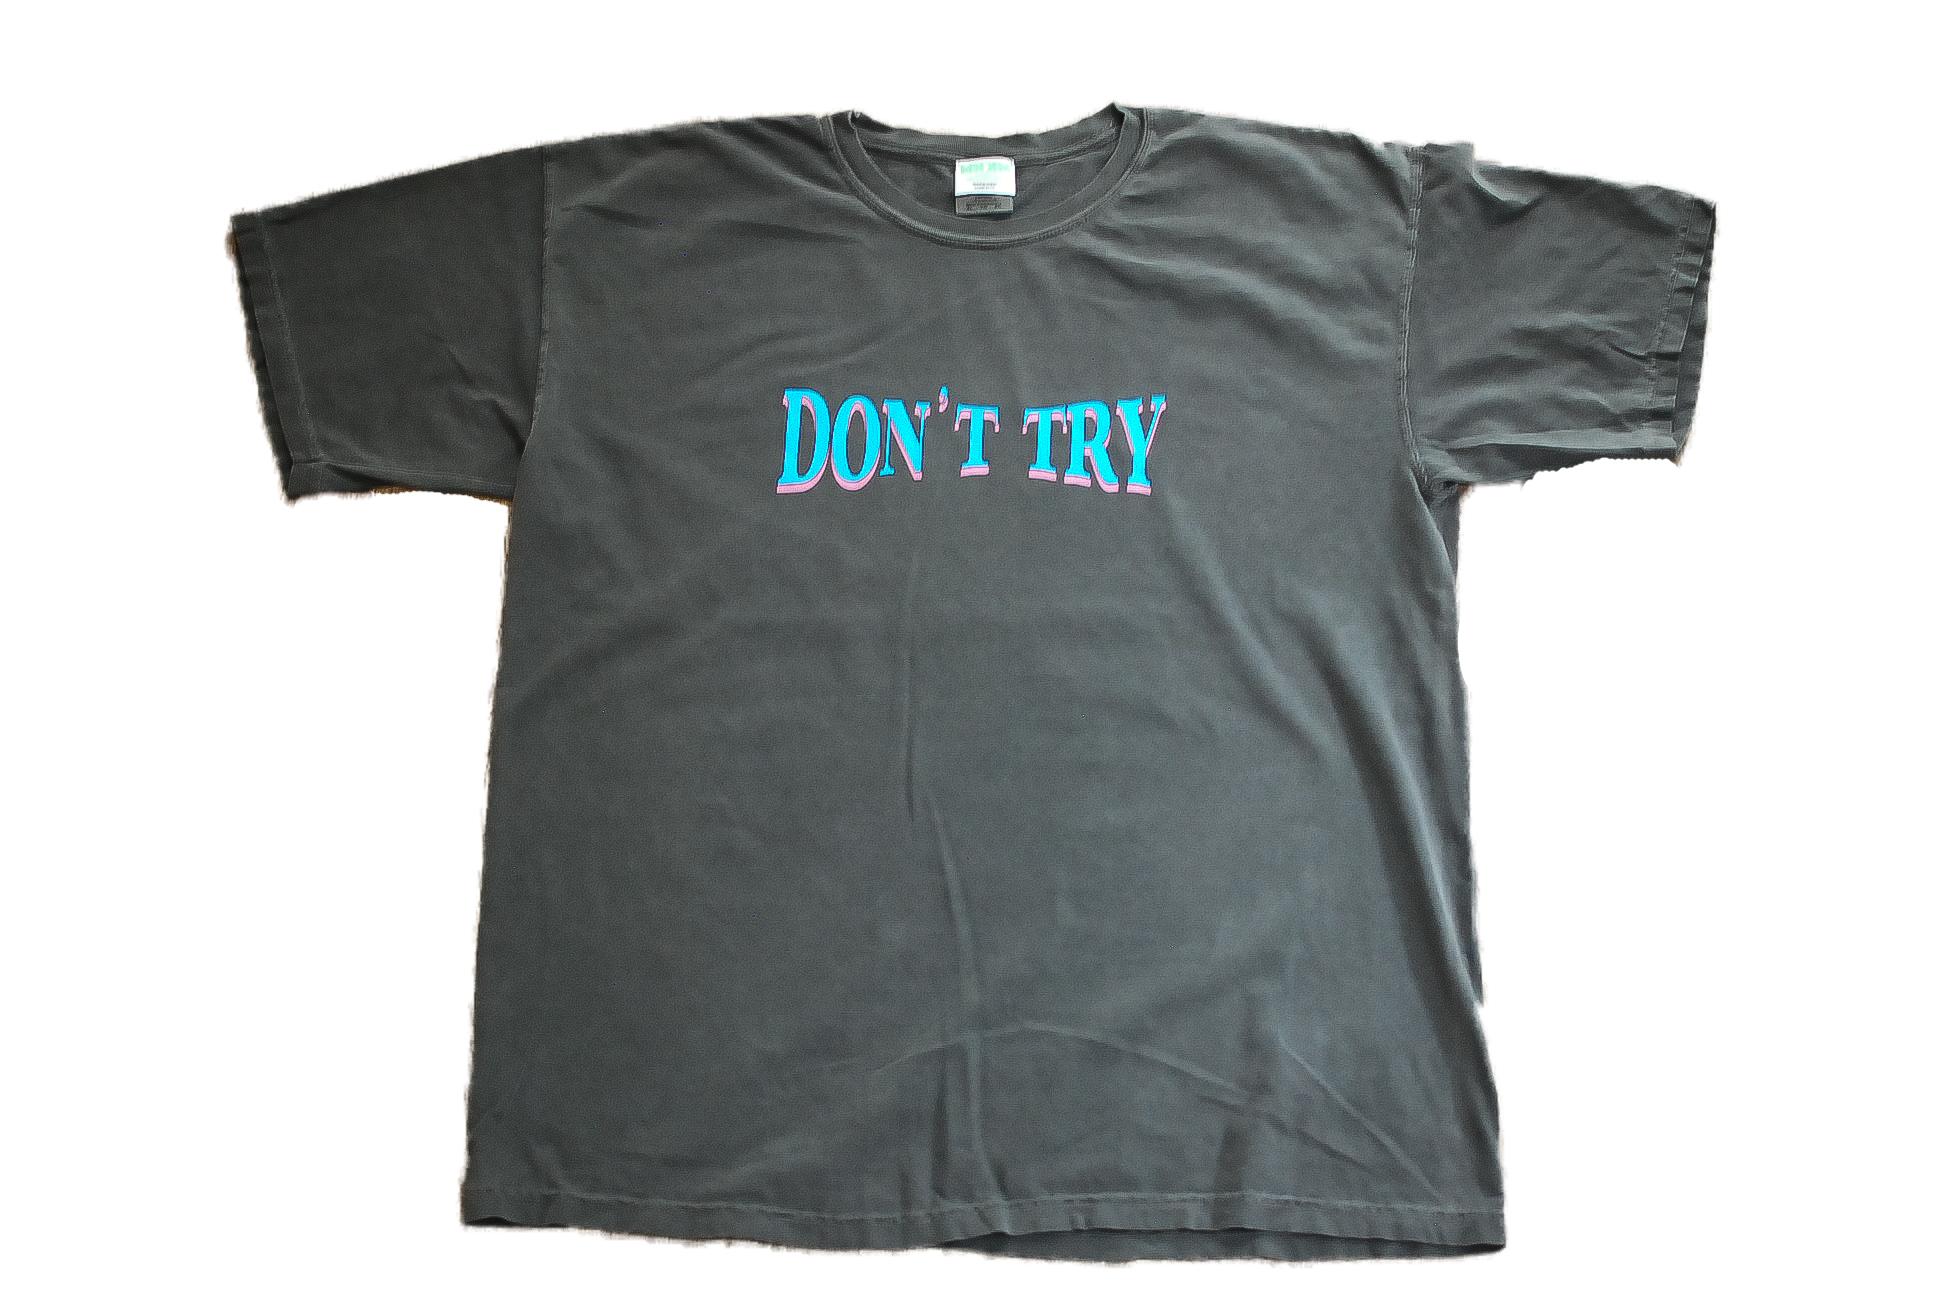 【UNISEX】Don't try Emblem Tee